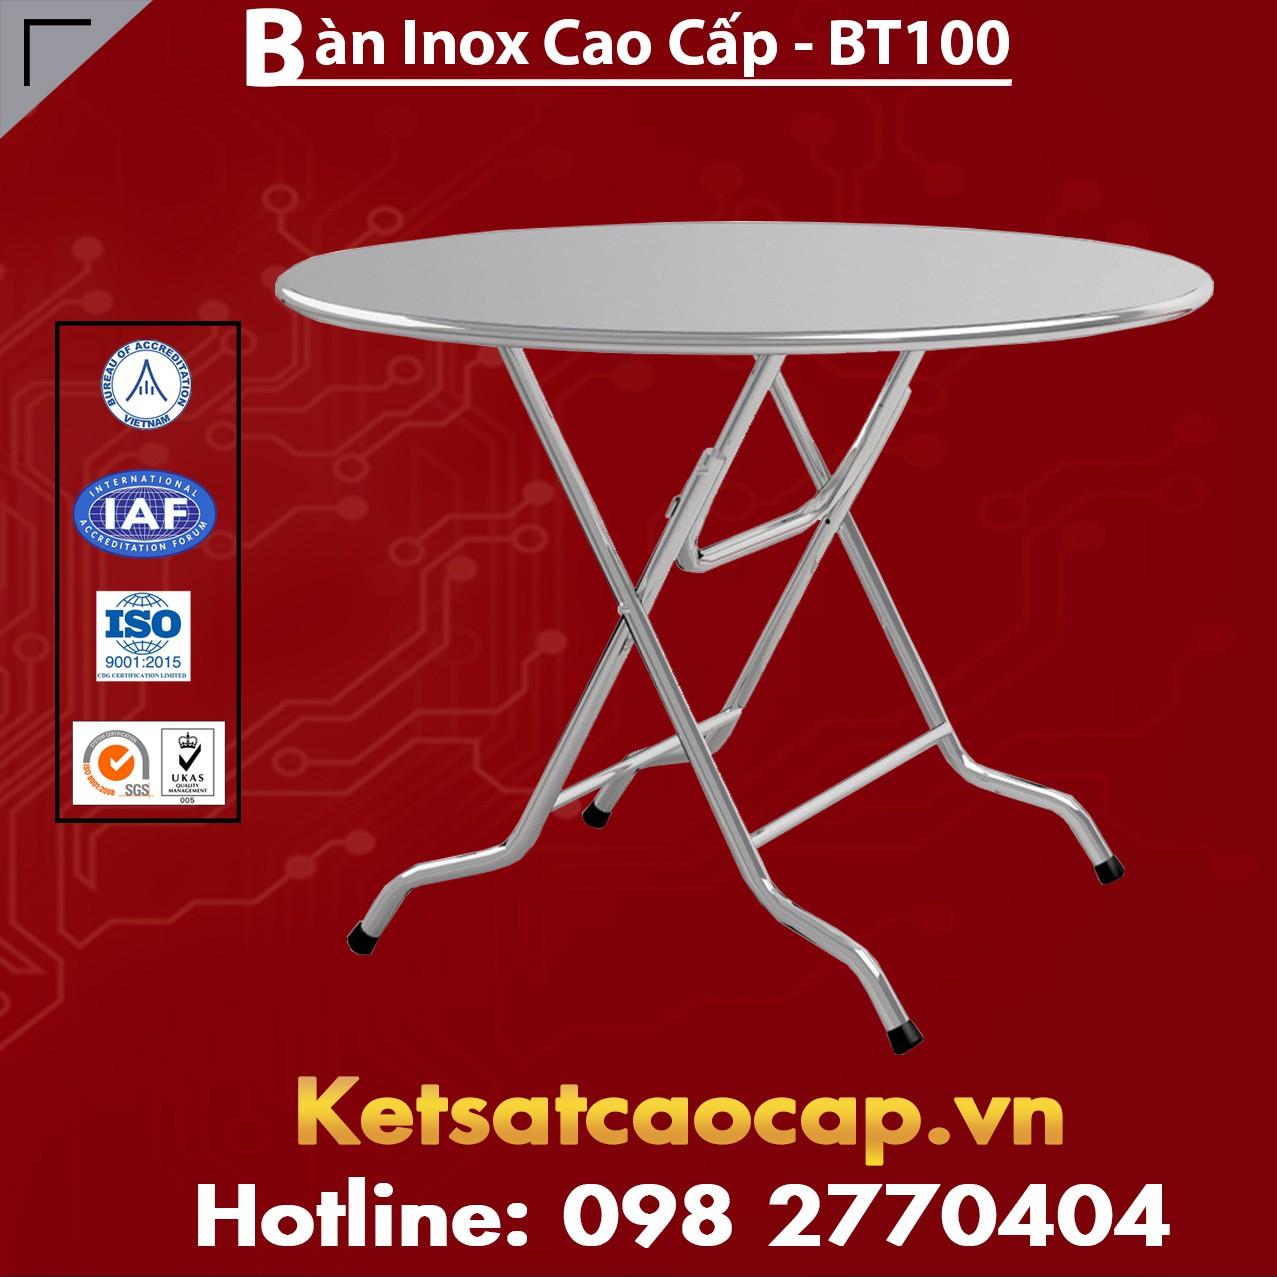 Bàn Inox Cao Cấp - BT100